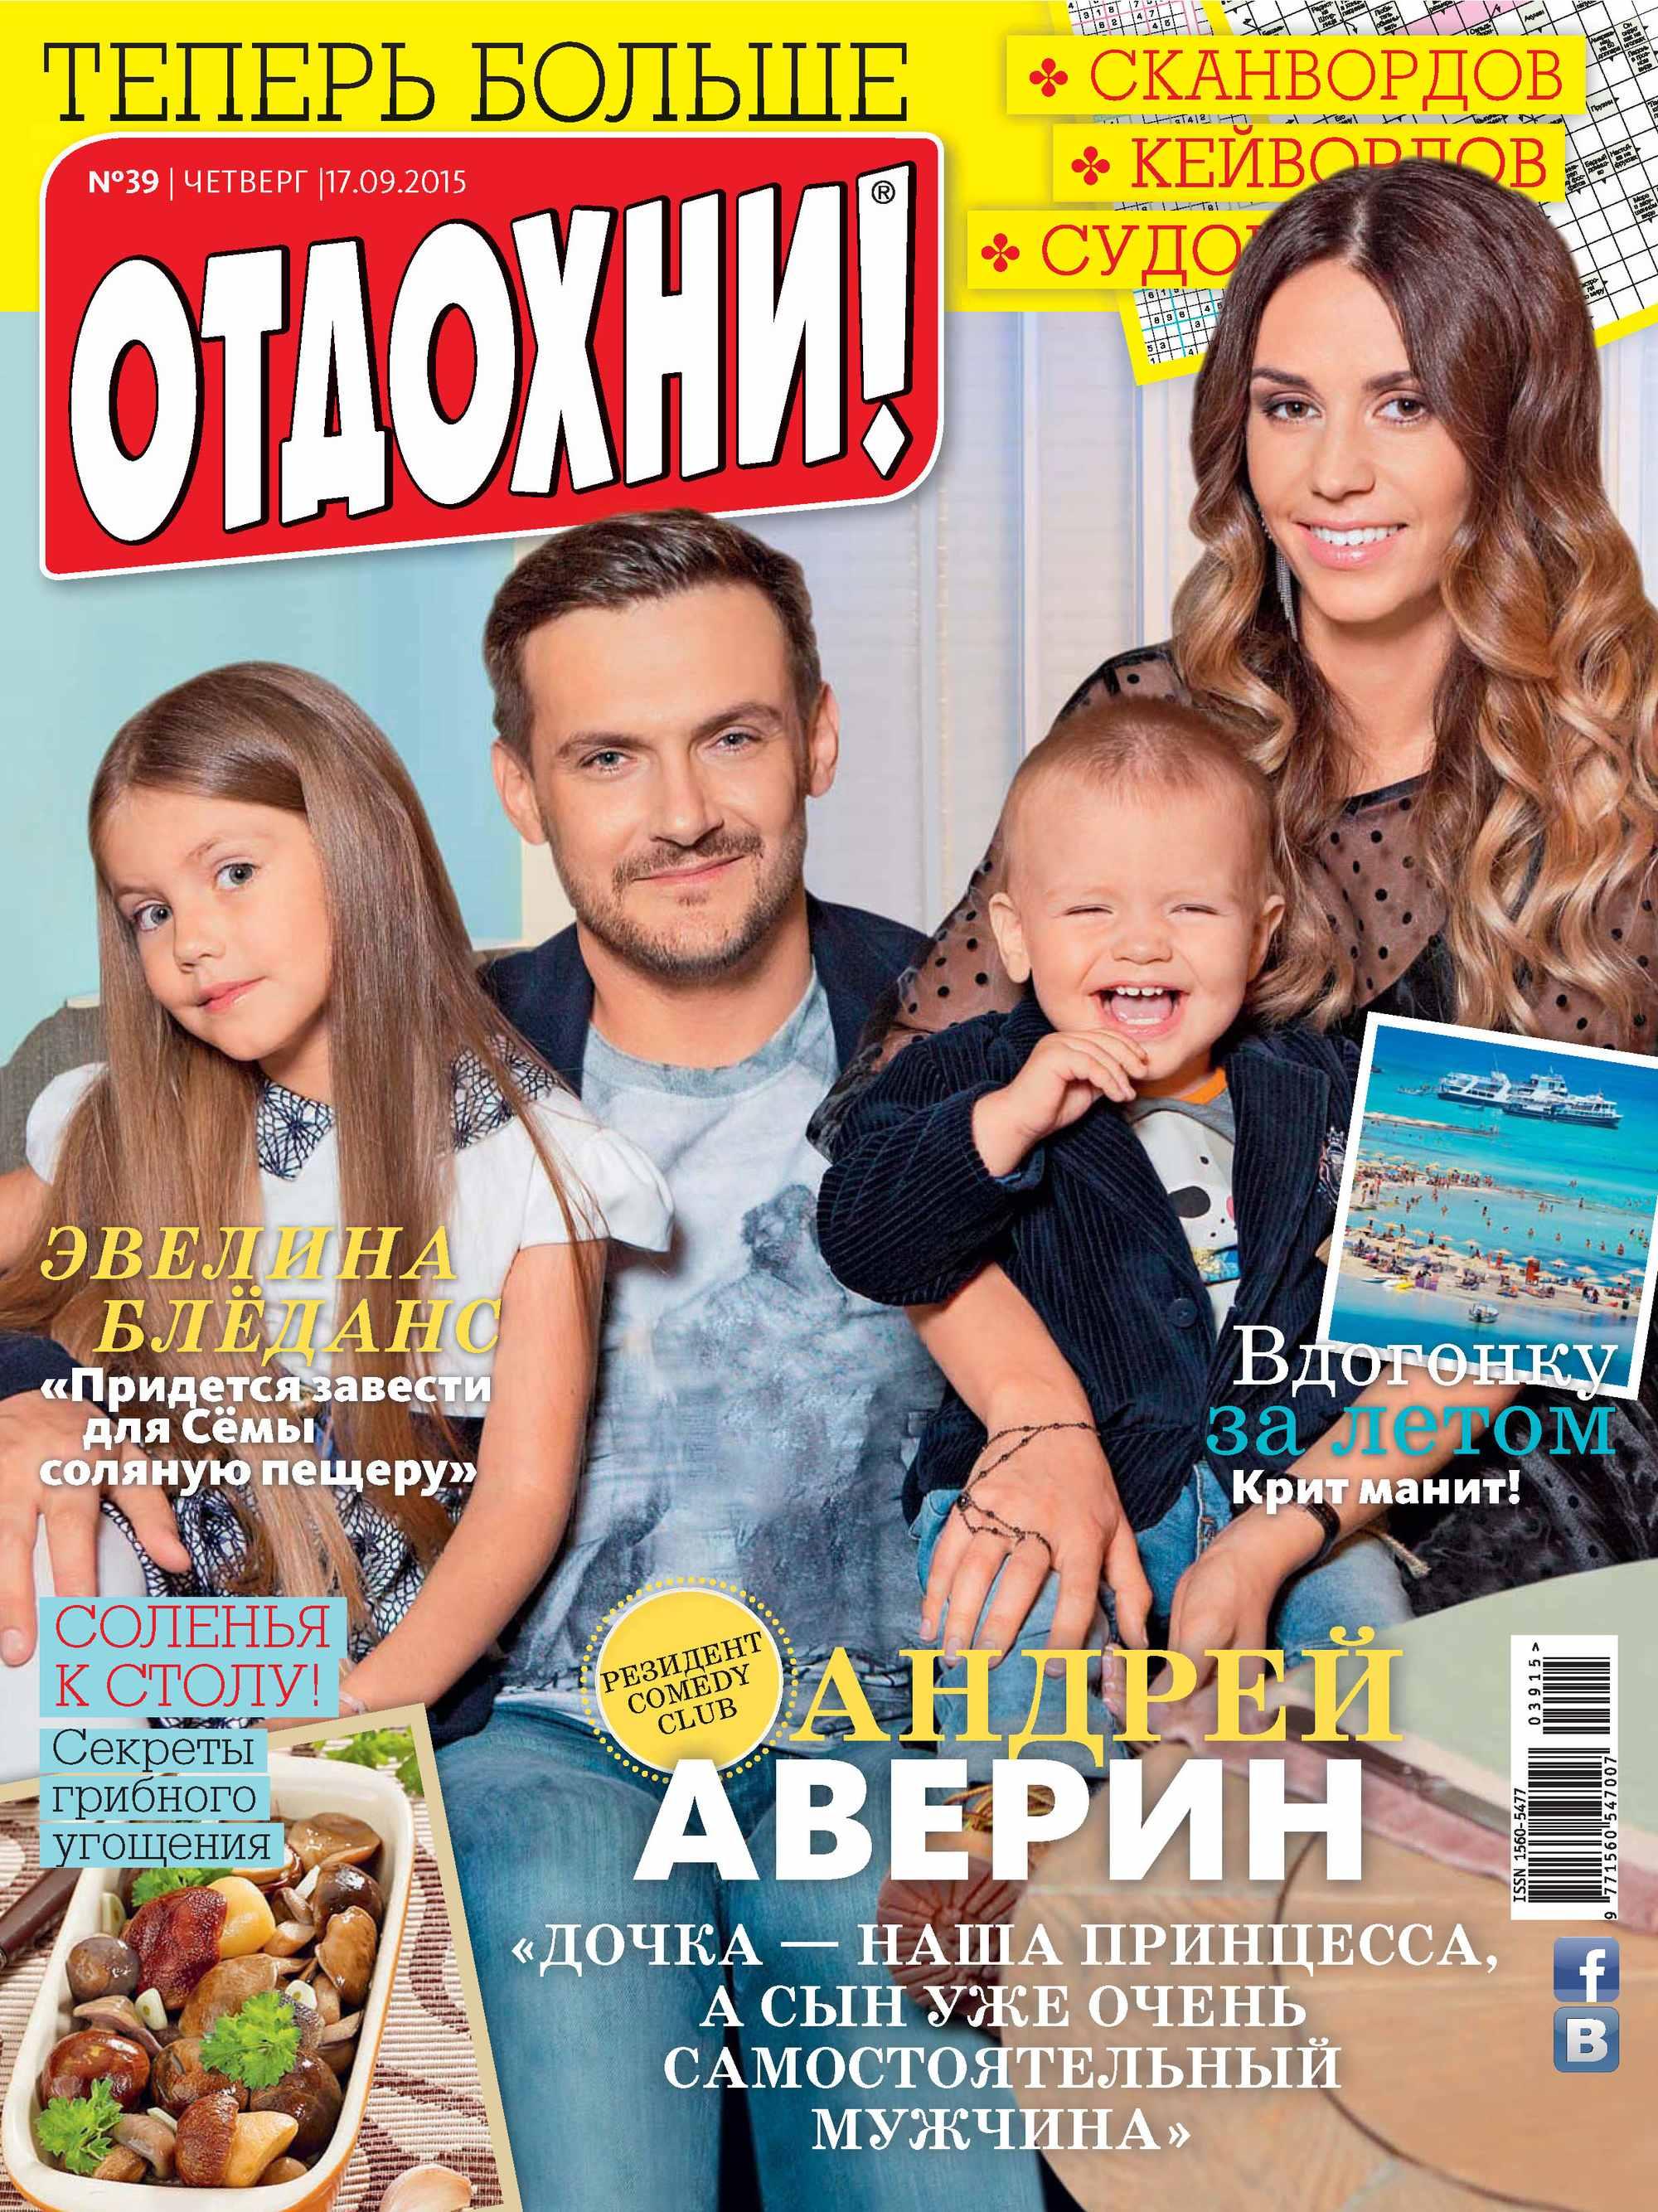 ИД «Бурда» Журнал «Отдохни!» №39/2015 ид бурда журнал отдохни 30 2015